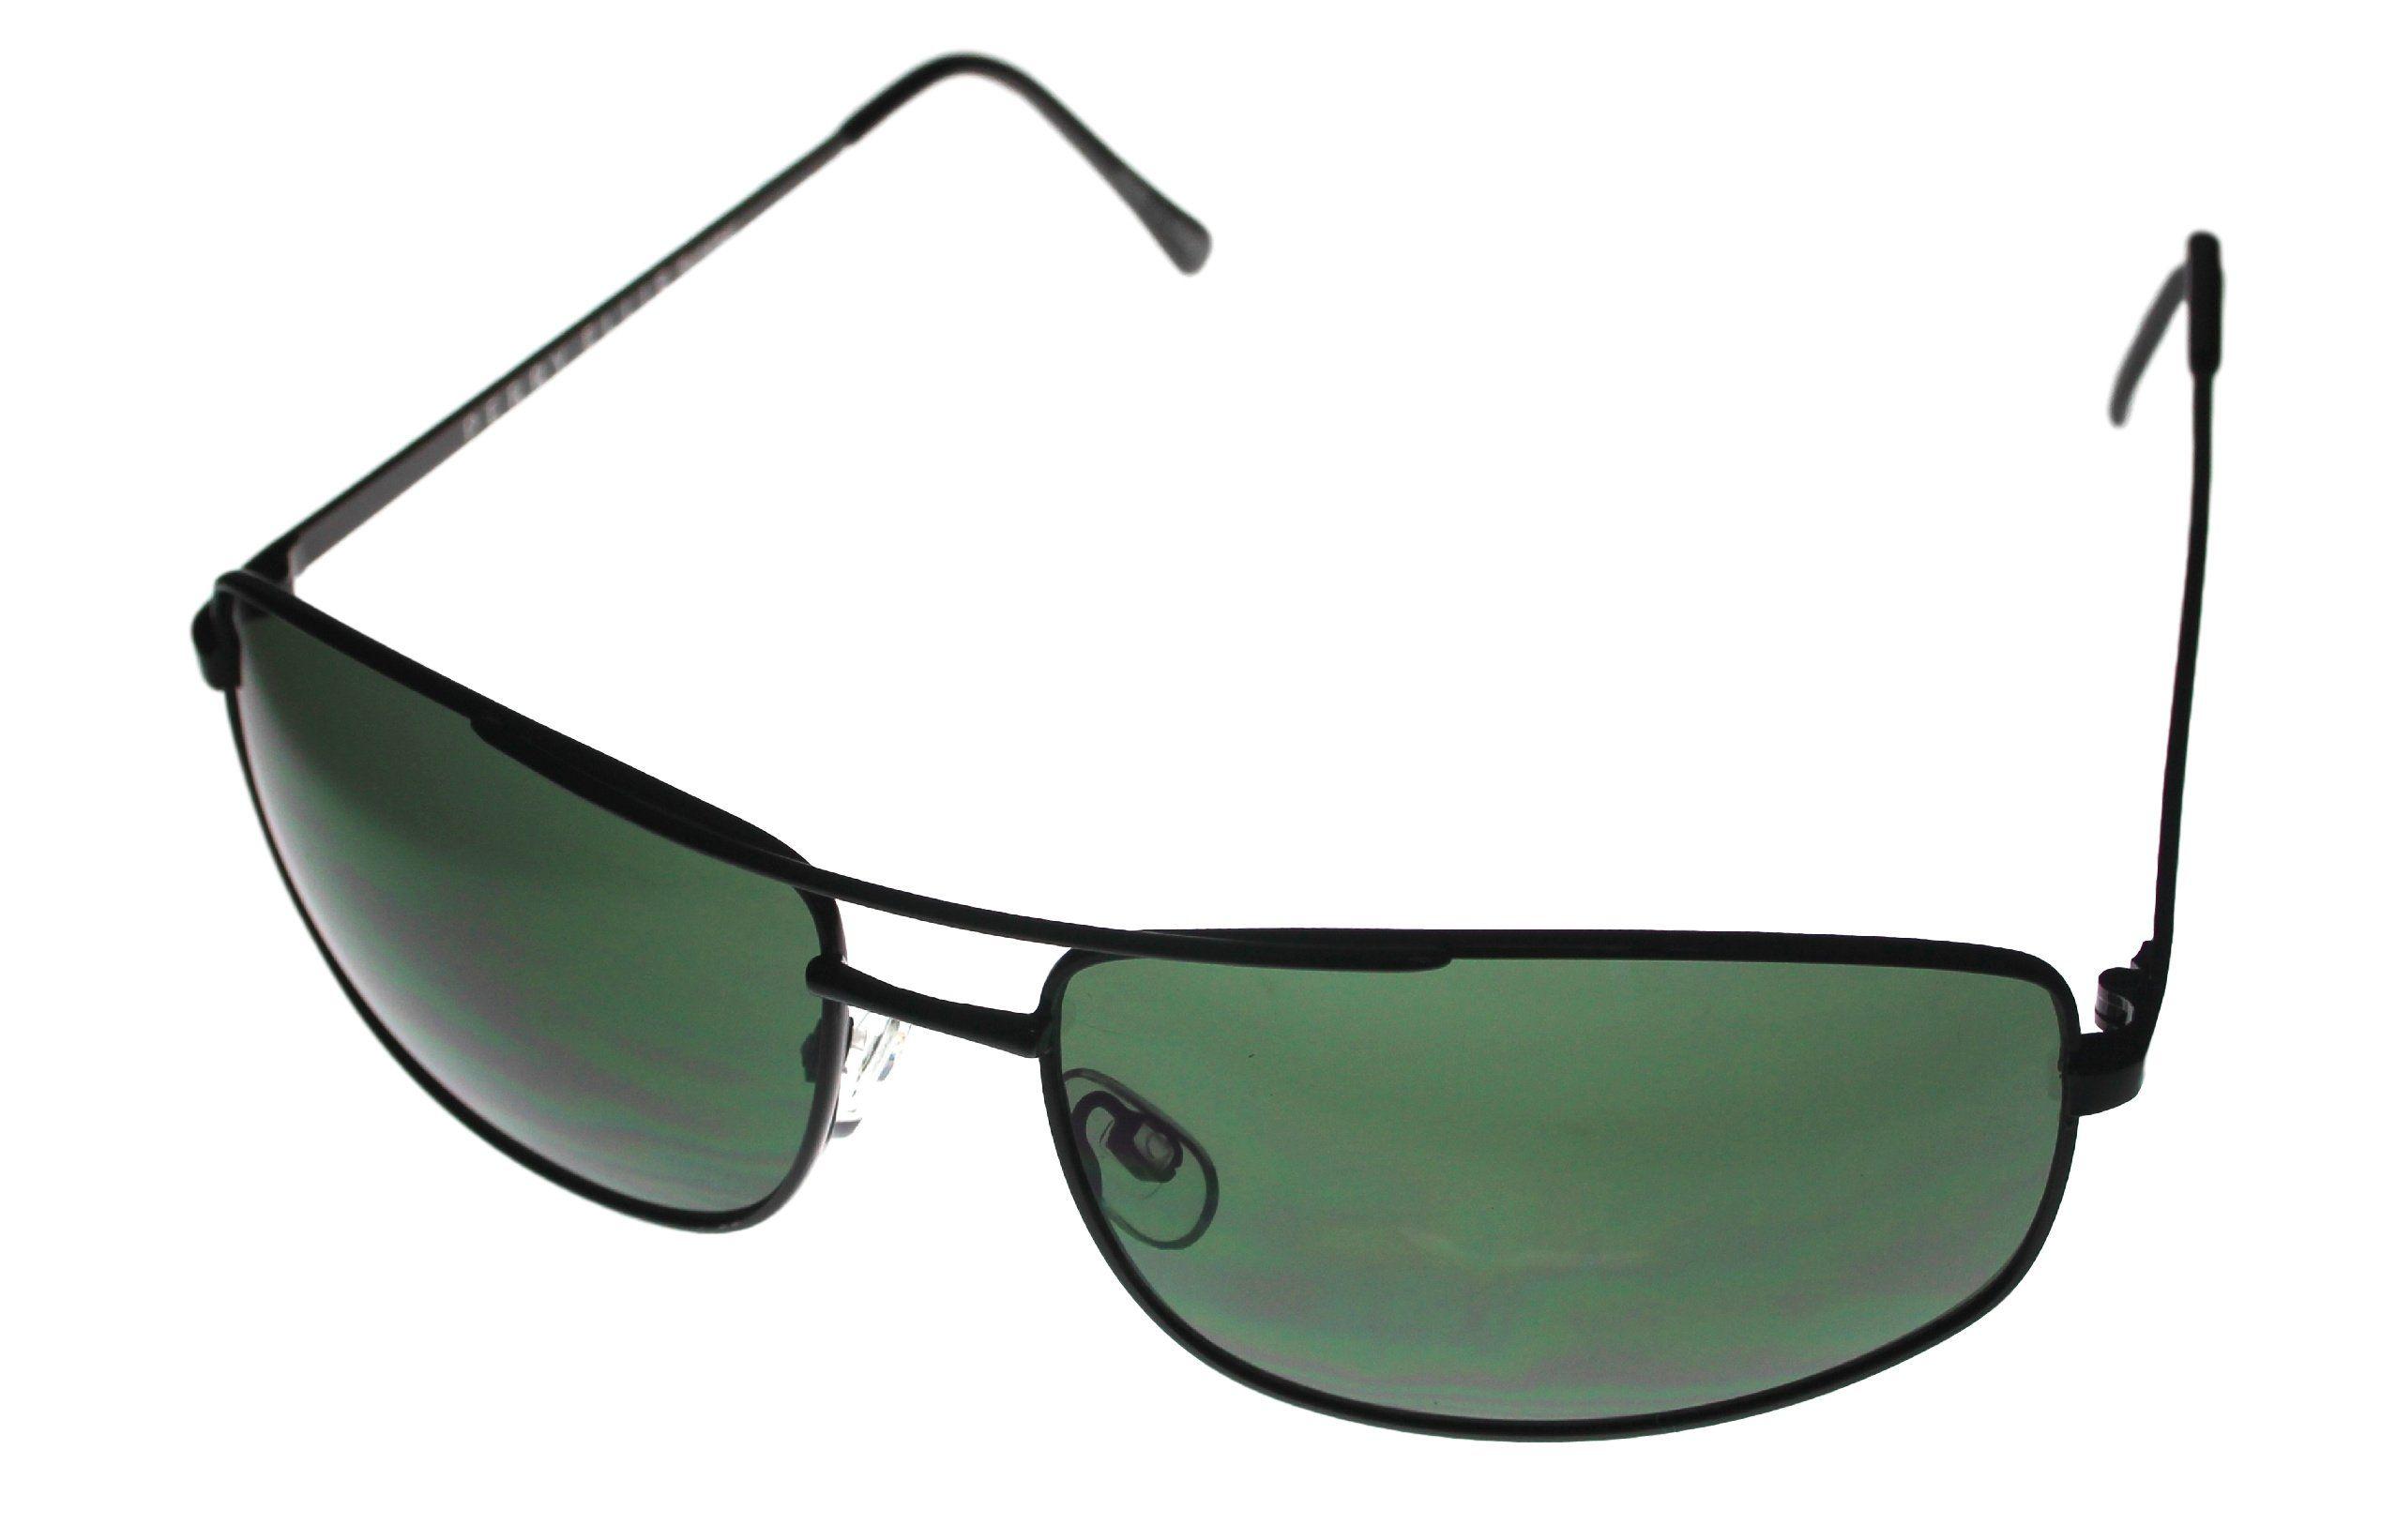 b5cb2b4a482 Perry Ellis Mens Sunglasses Black Metal Rectangle Wrap PE65 1     Visit the  image